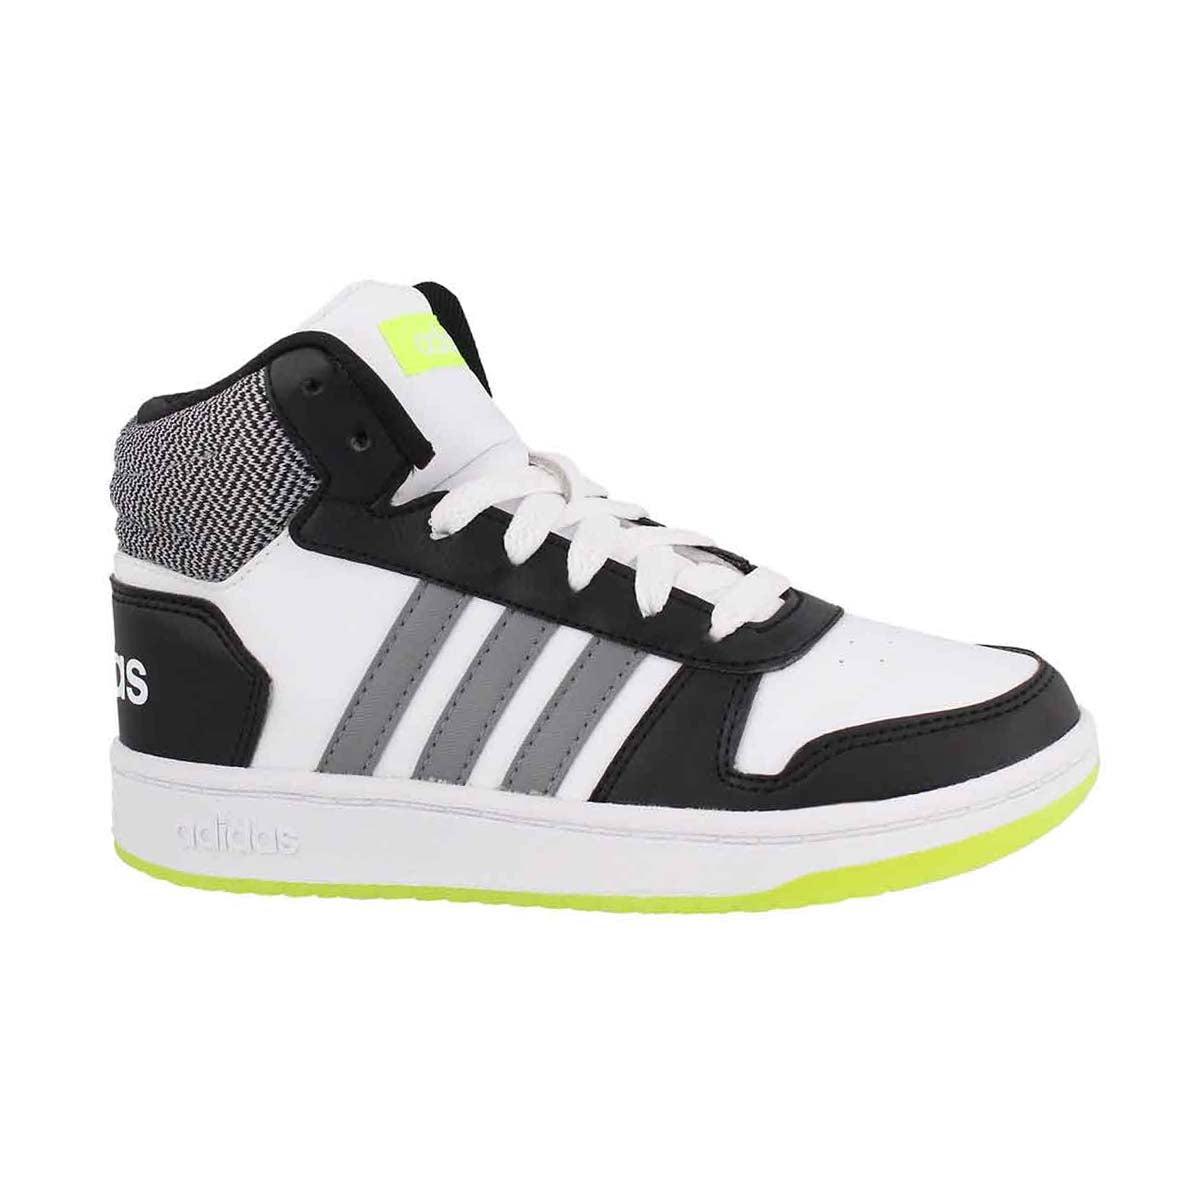 2918d6b5f Boys  V5 HOOPS MID 2.0 white grey black sneakers